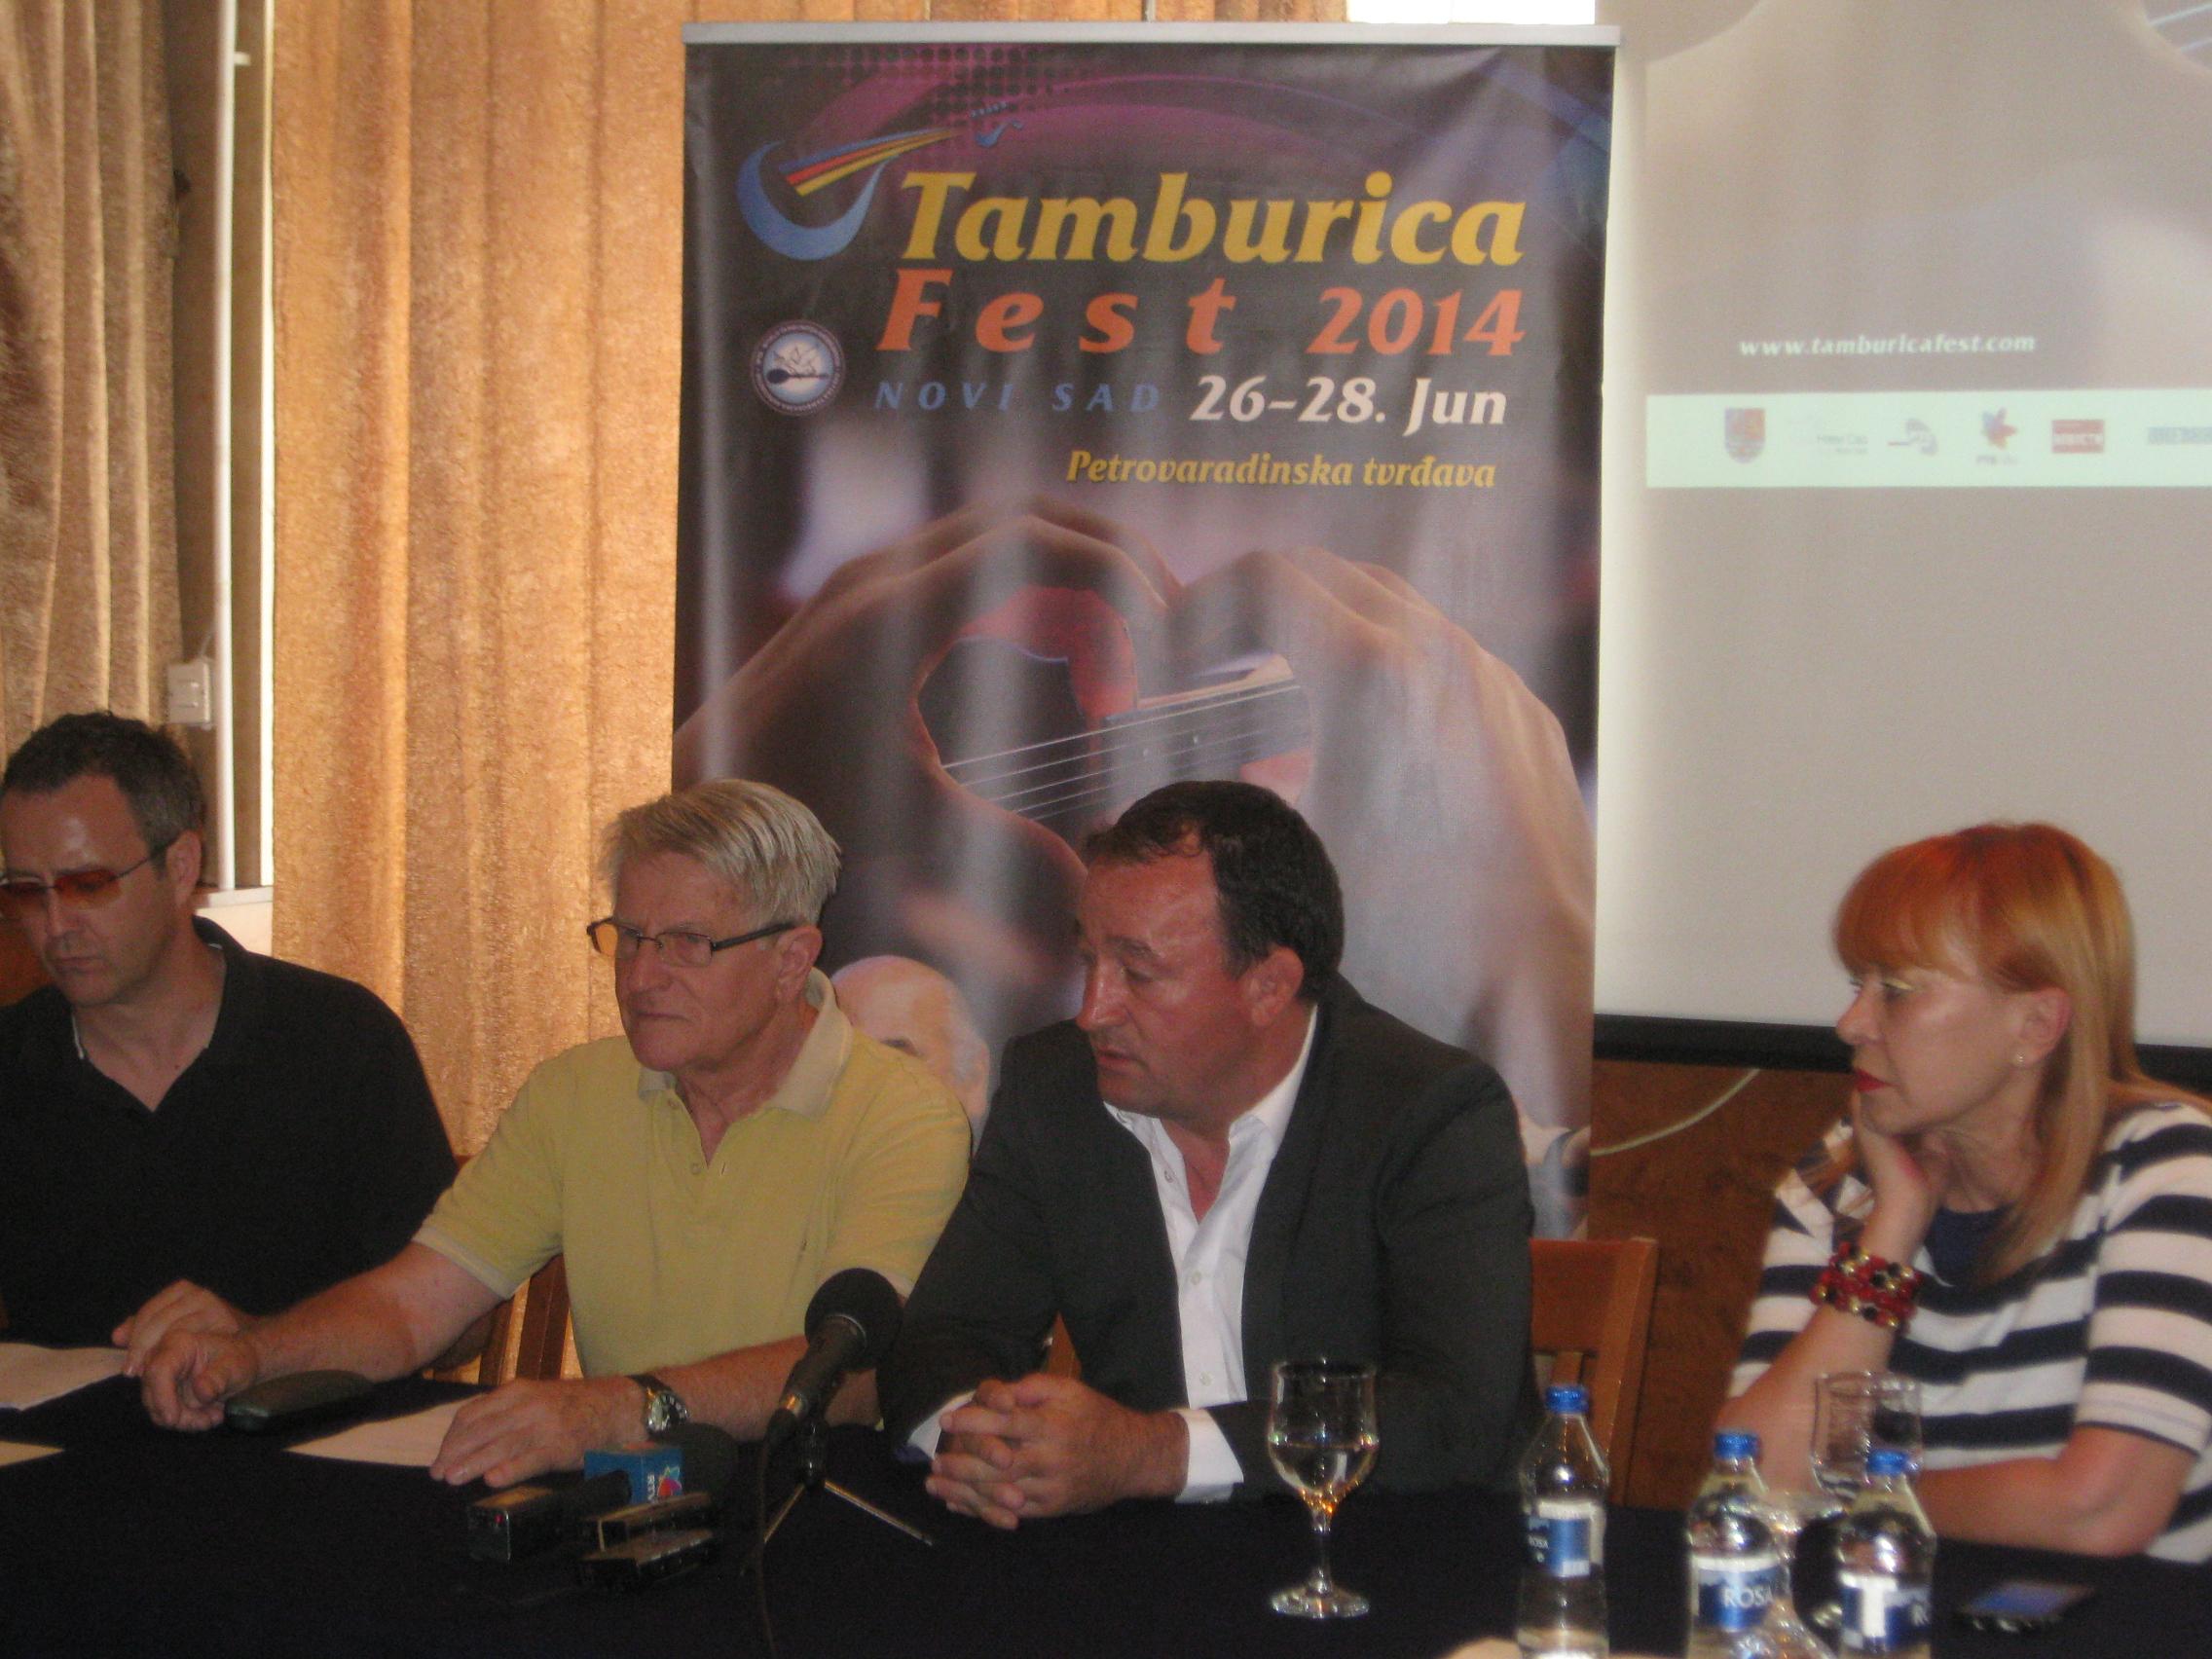 18 JUN TAMBURICA PRES DANILO NINKOVIC JOVAN ADAMOV JOVAN PEJCIC DINA VRANESEVIC